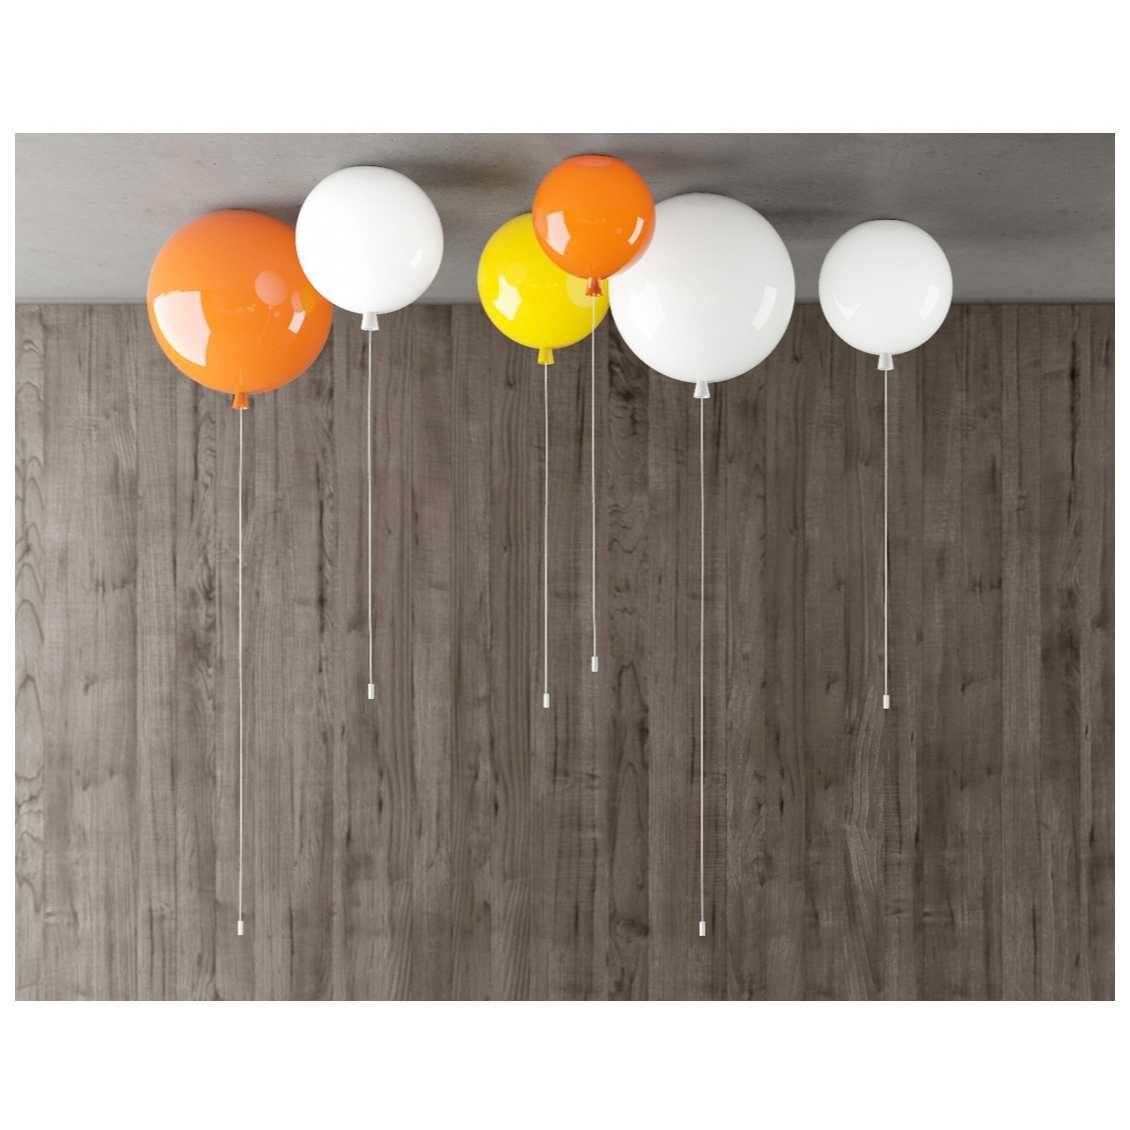 Brokis Memory Hanglamp Hanglamp Slaapkamer Plafond Verlichting Ballon Lichtjes